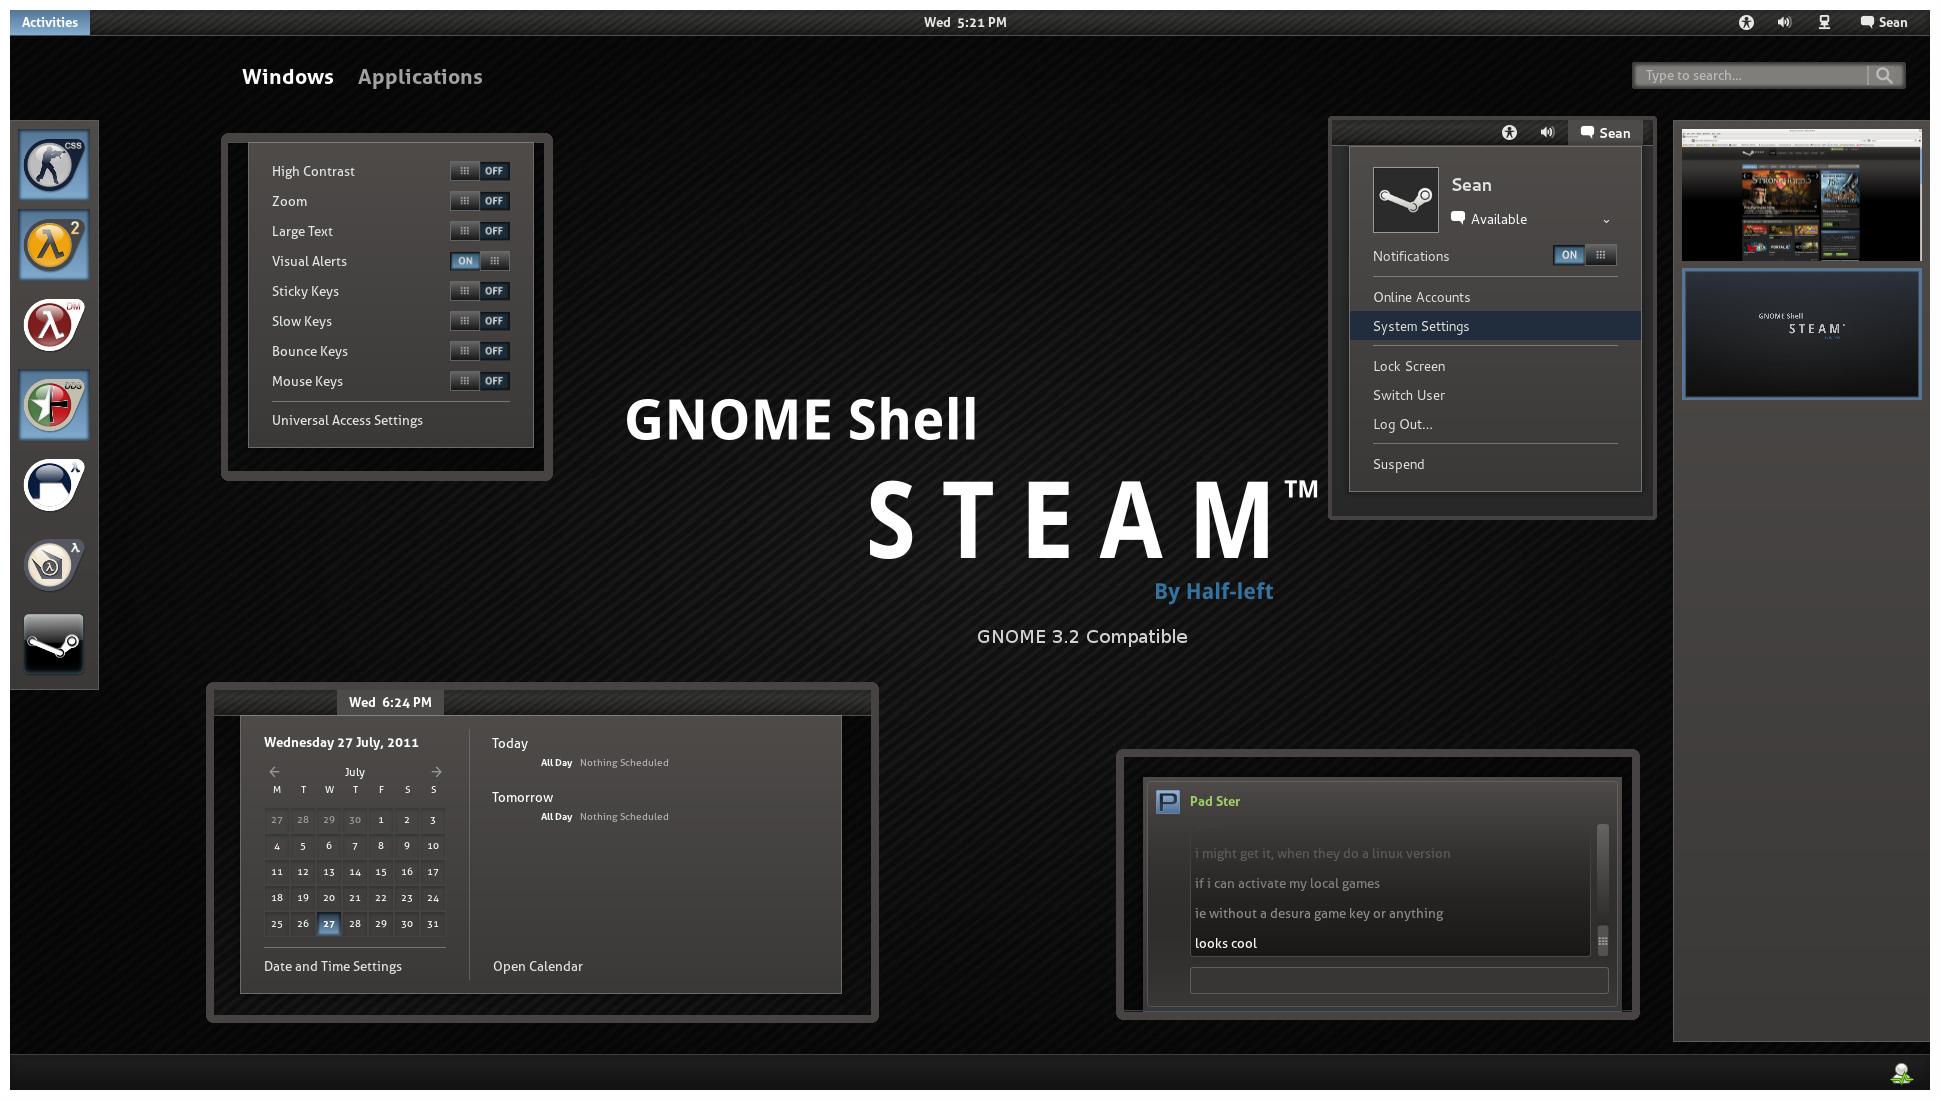 GNOME Shell - Steam